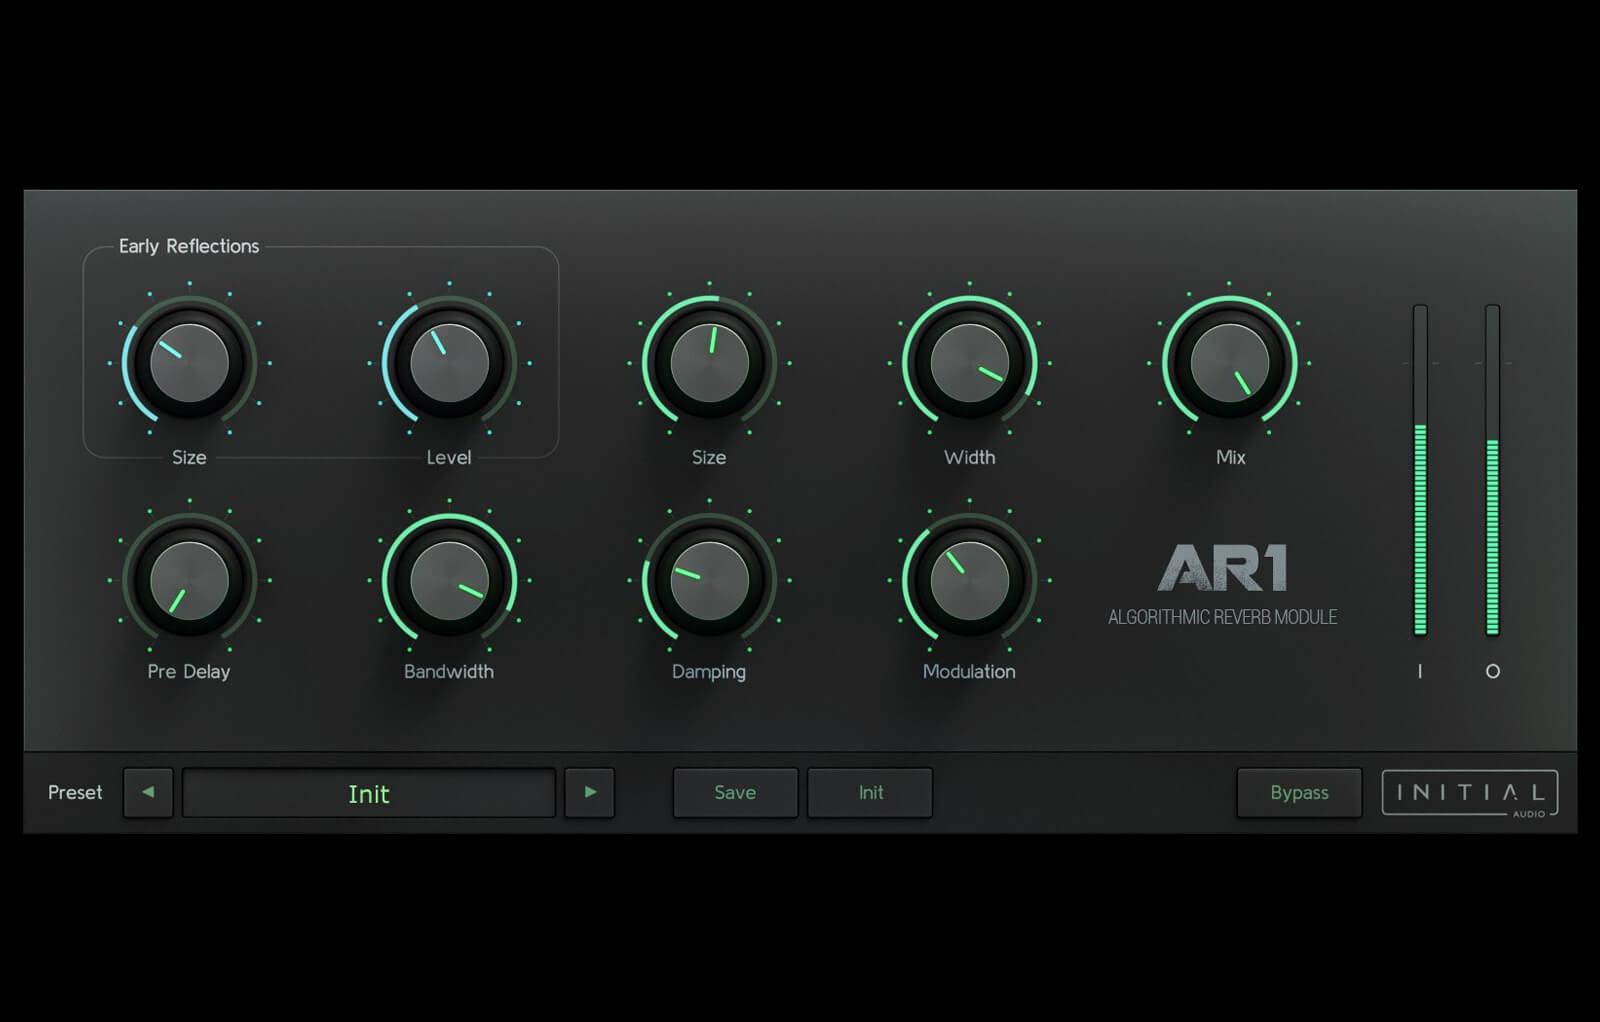 AR1 Reverb